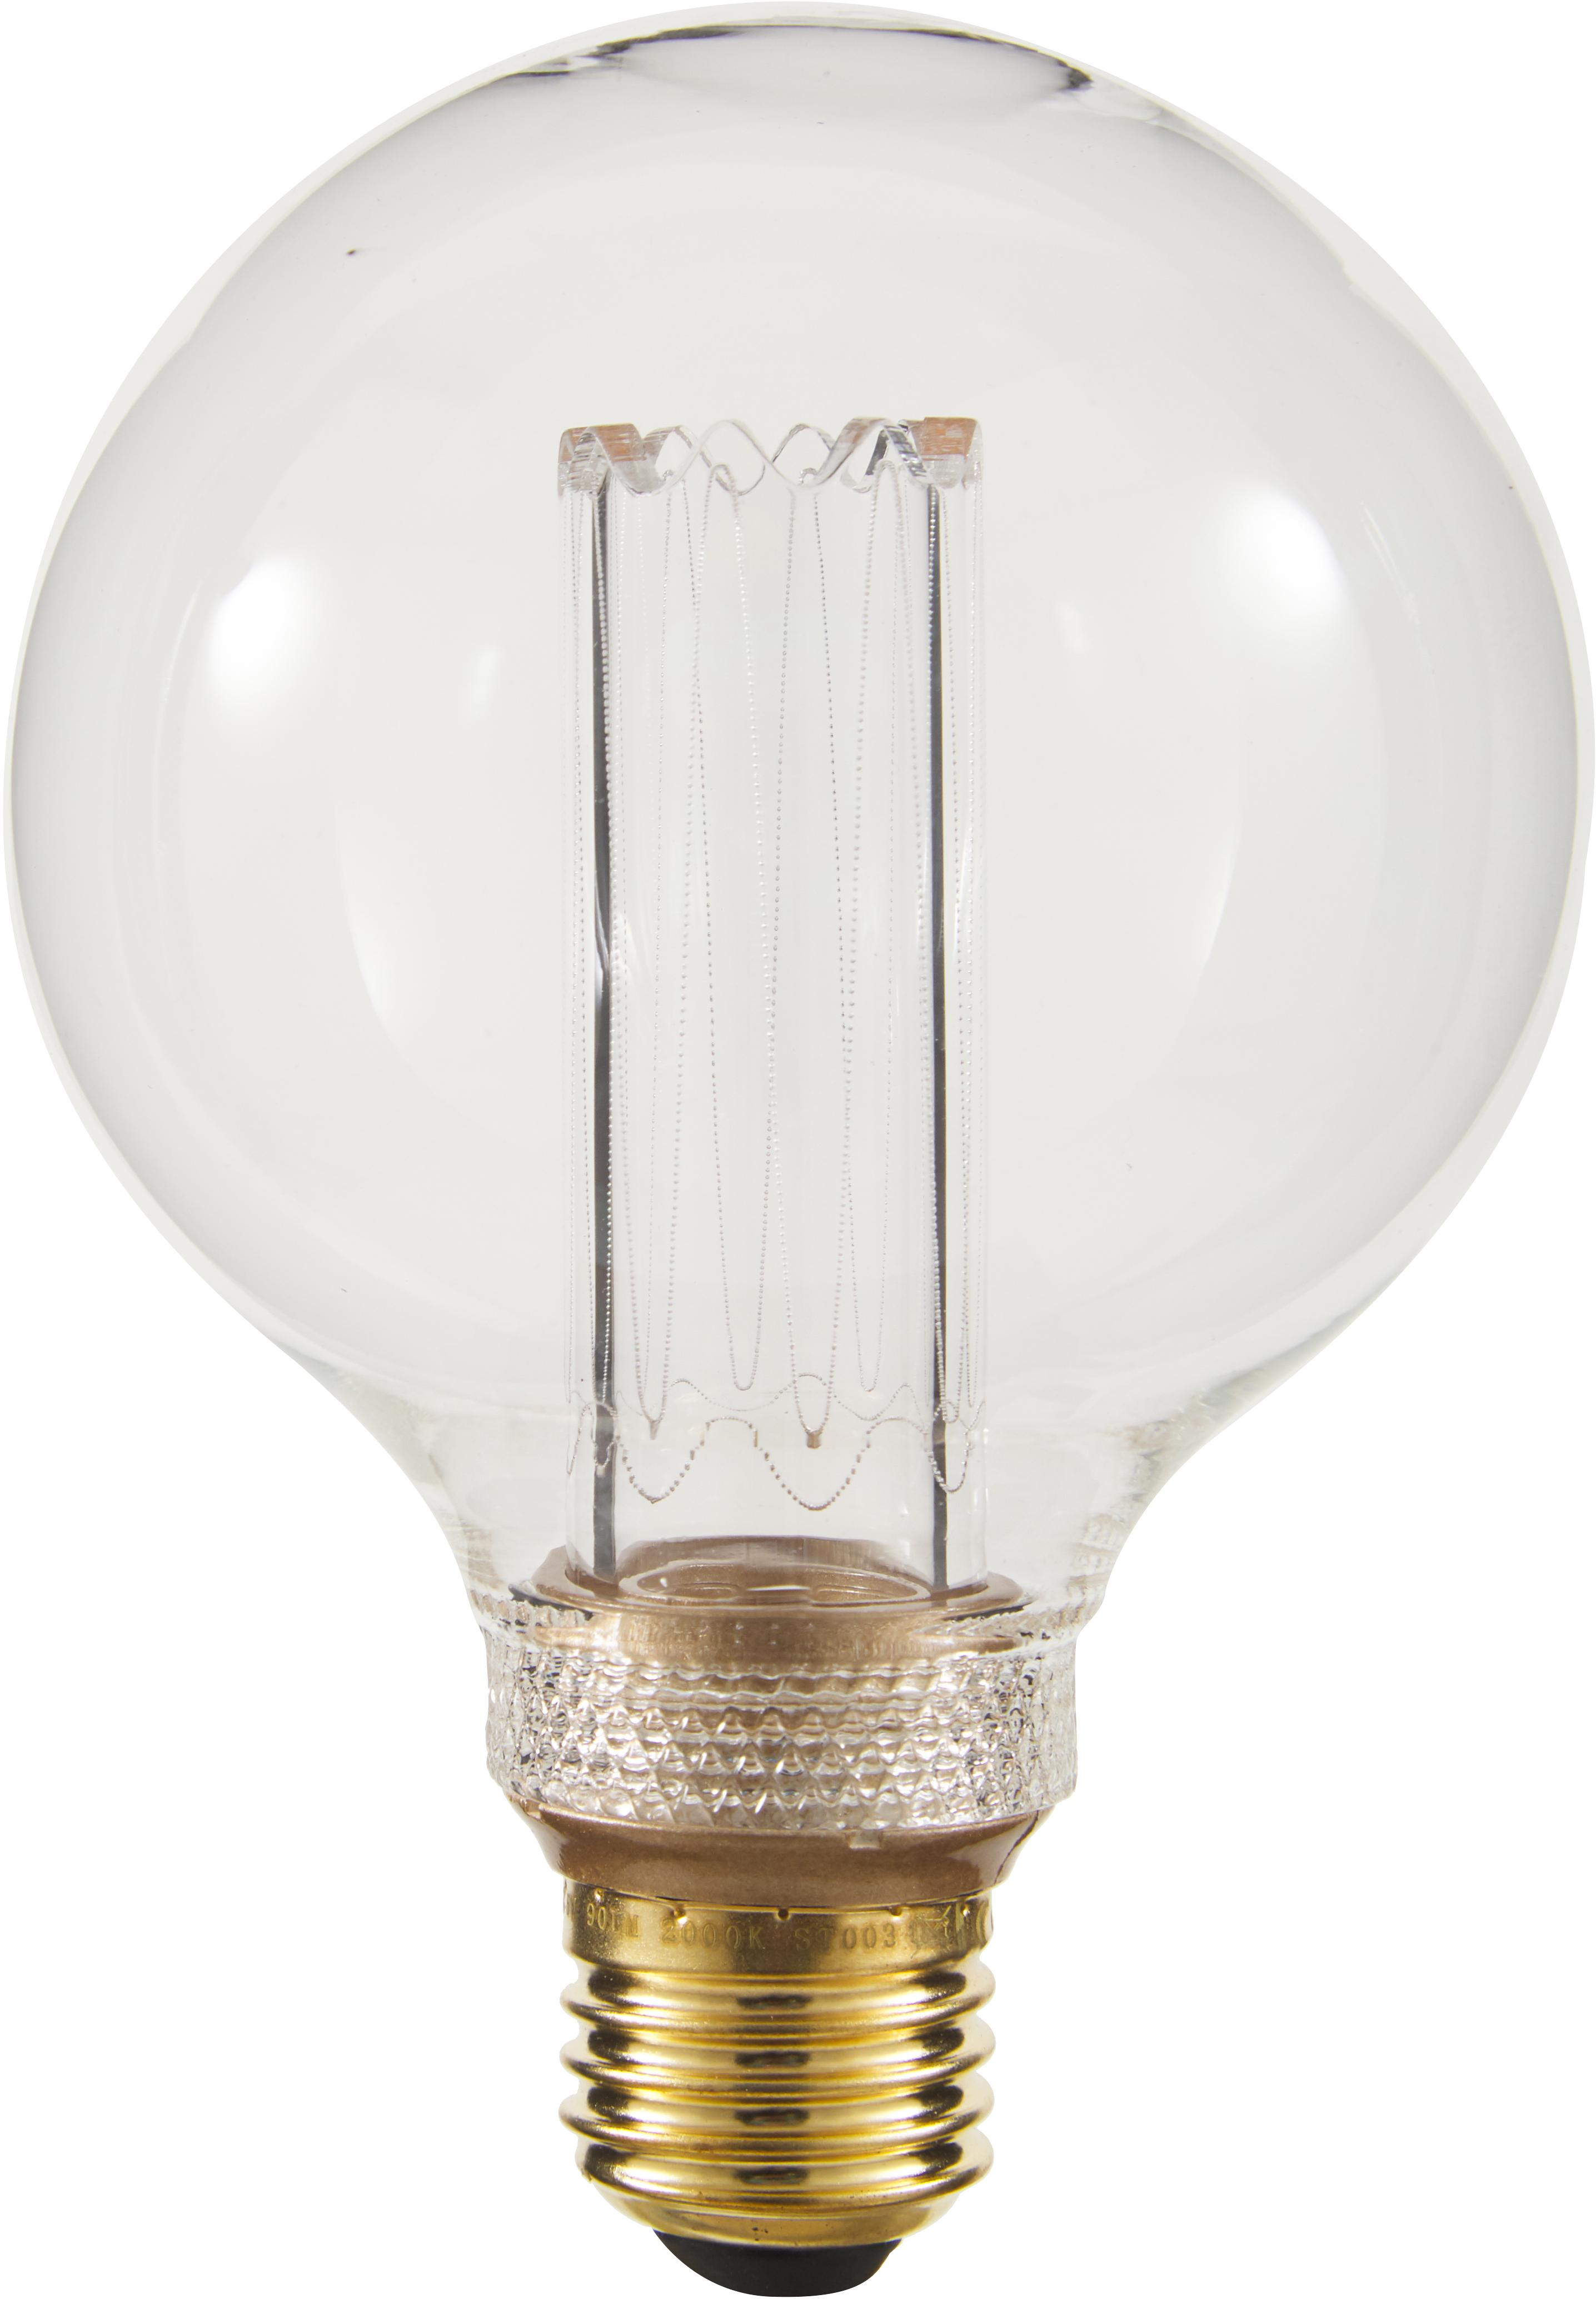 Dimbaar XL LED lamp New Generation (E27/ 2.5W), Fitting: messing, Amberkleurig, Ø 10 x H 15 cm